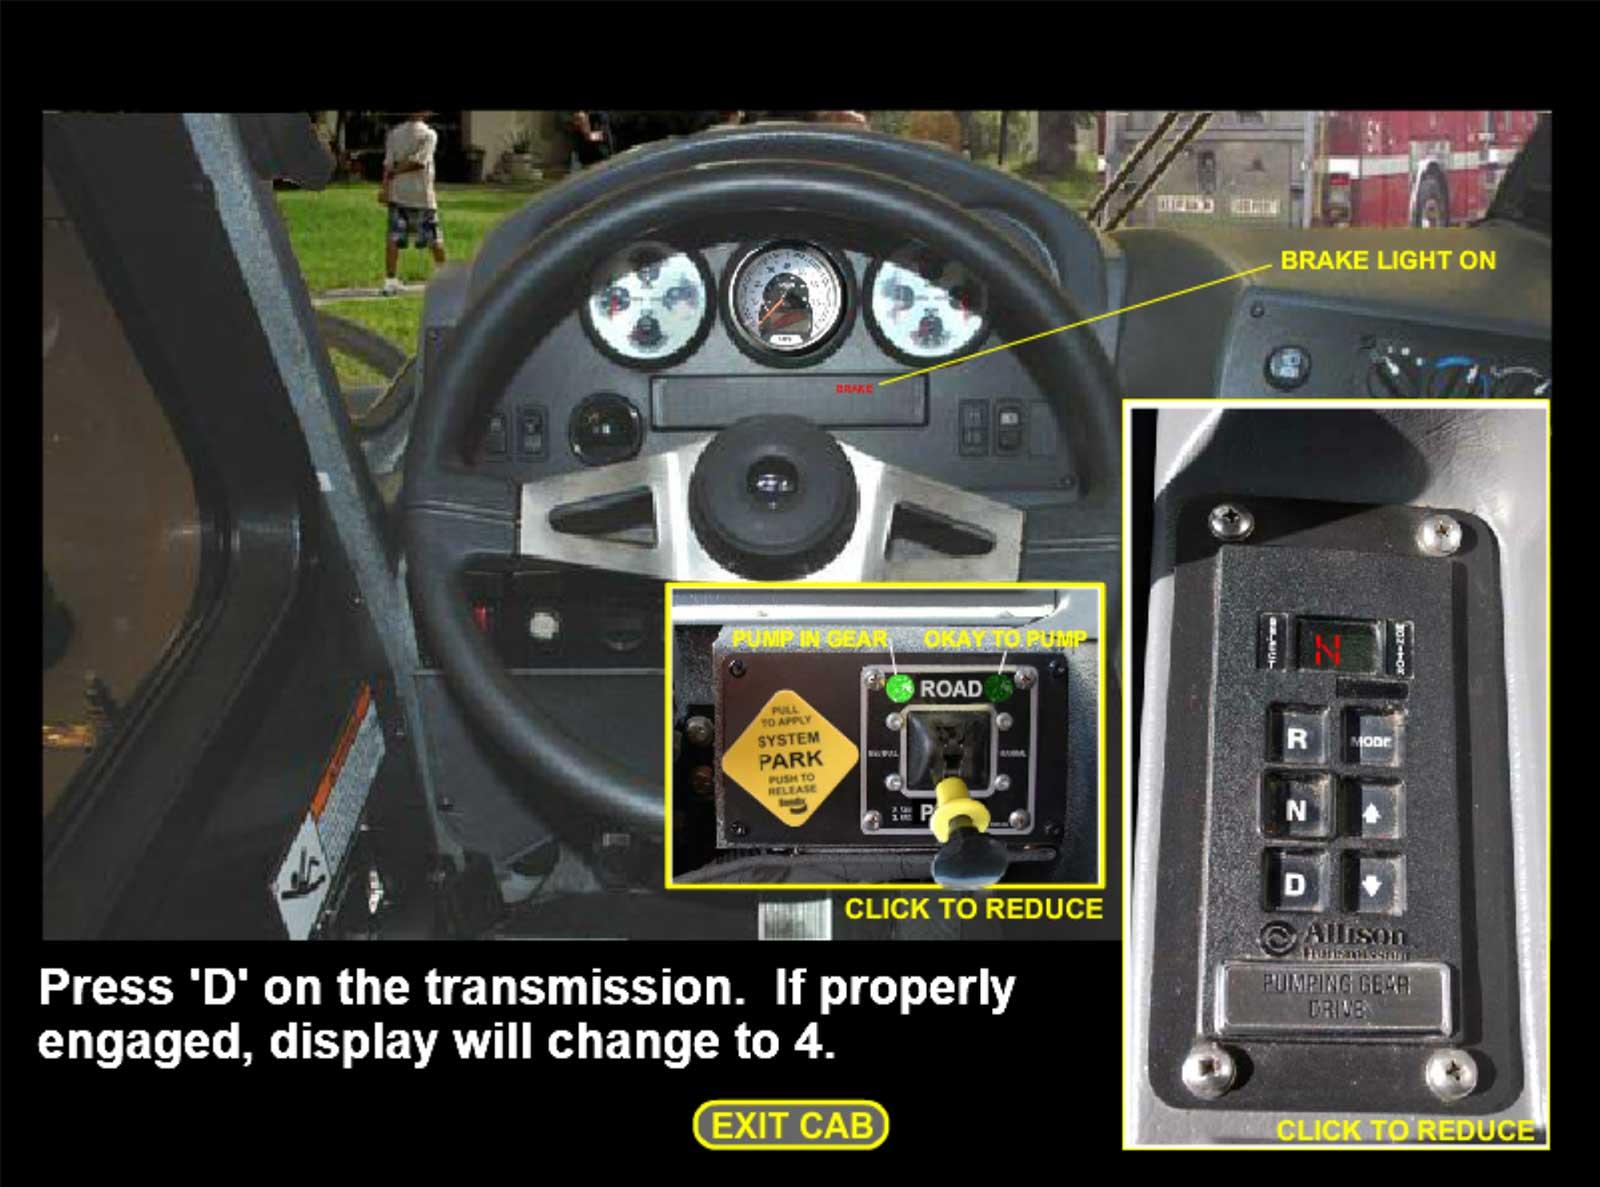 Steering wheel of fire engine